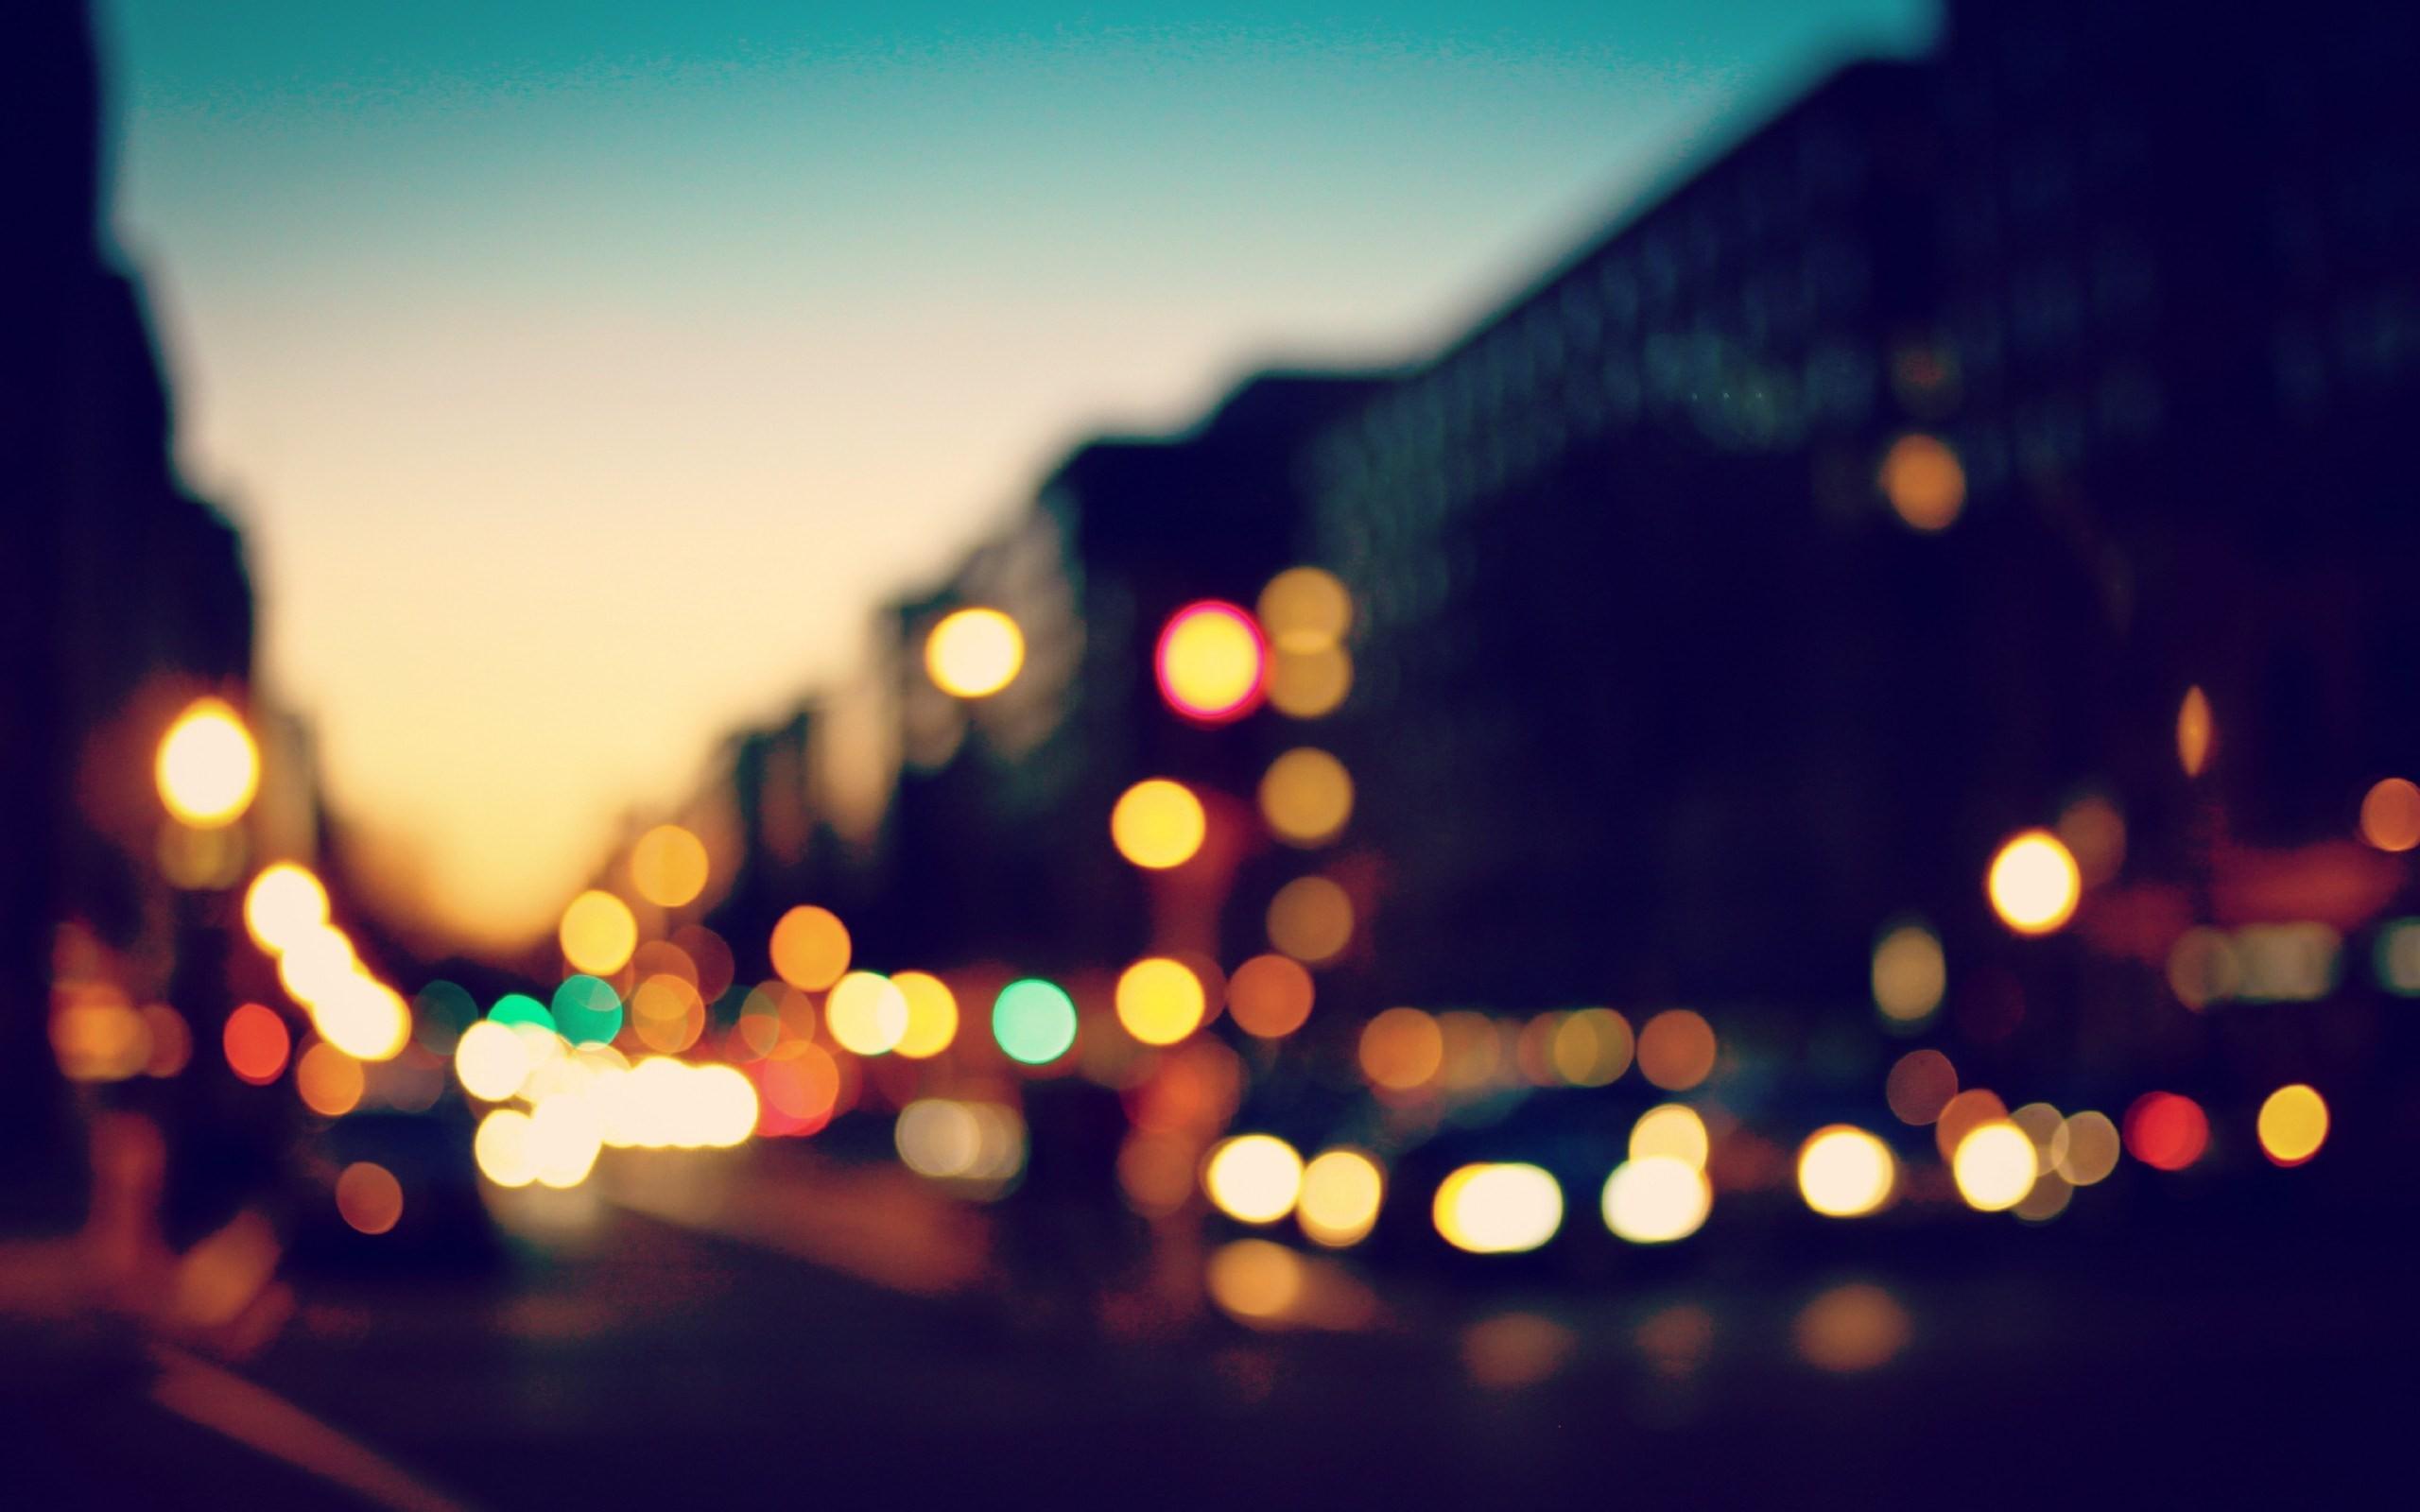 Amazing Wallpaper Night Evening - sunlight-city-night-evening-blurred-bokeh-dusk-light-color-lighting-darkness-150537  Graphic-12928.jpg